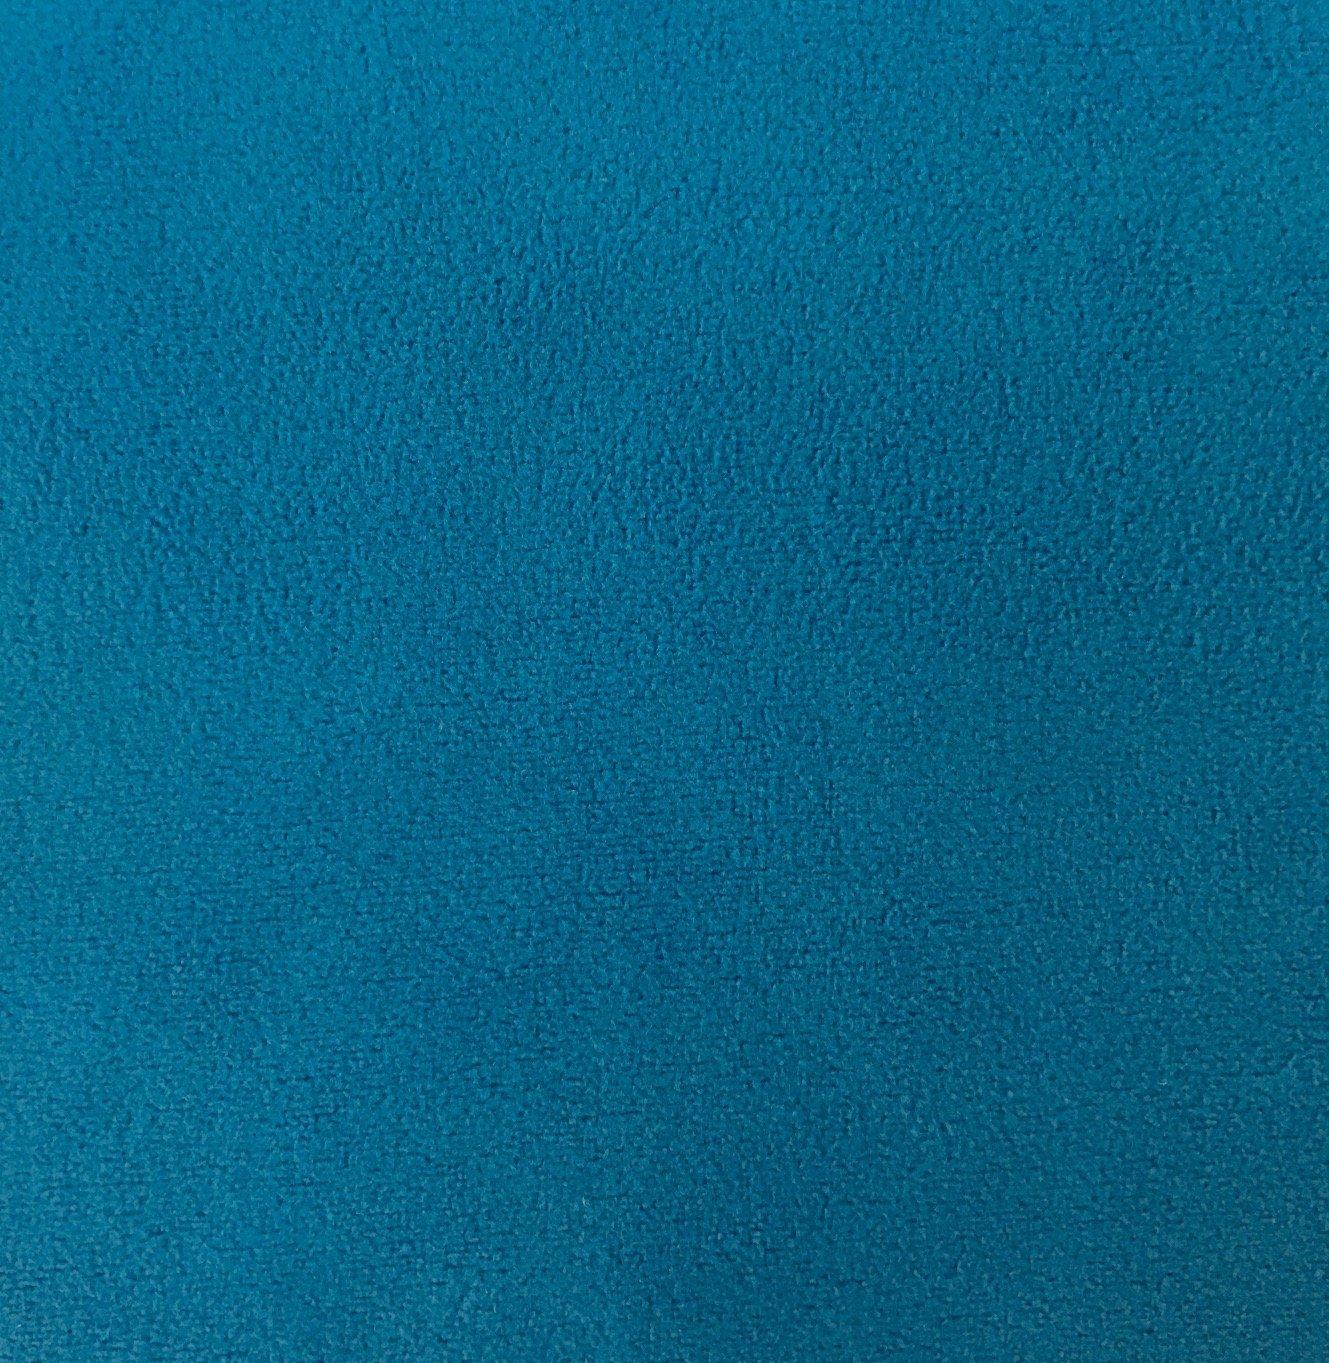 Double Fleece Velour - Turquoise